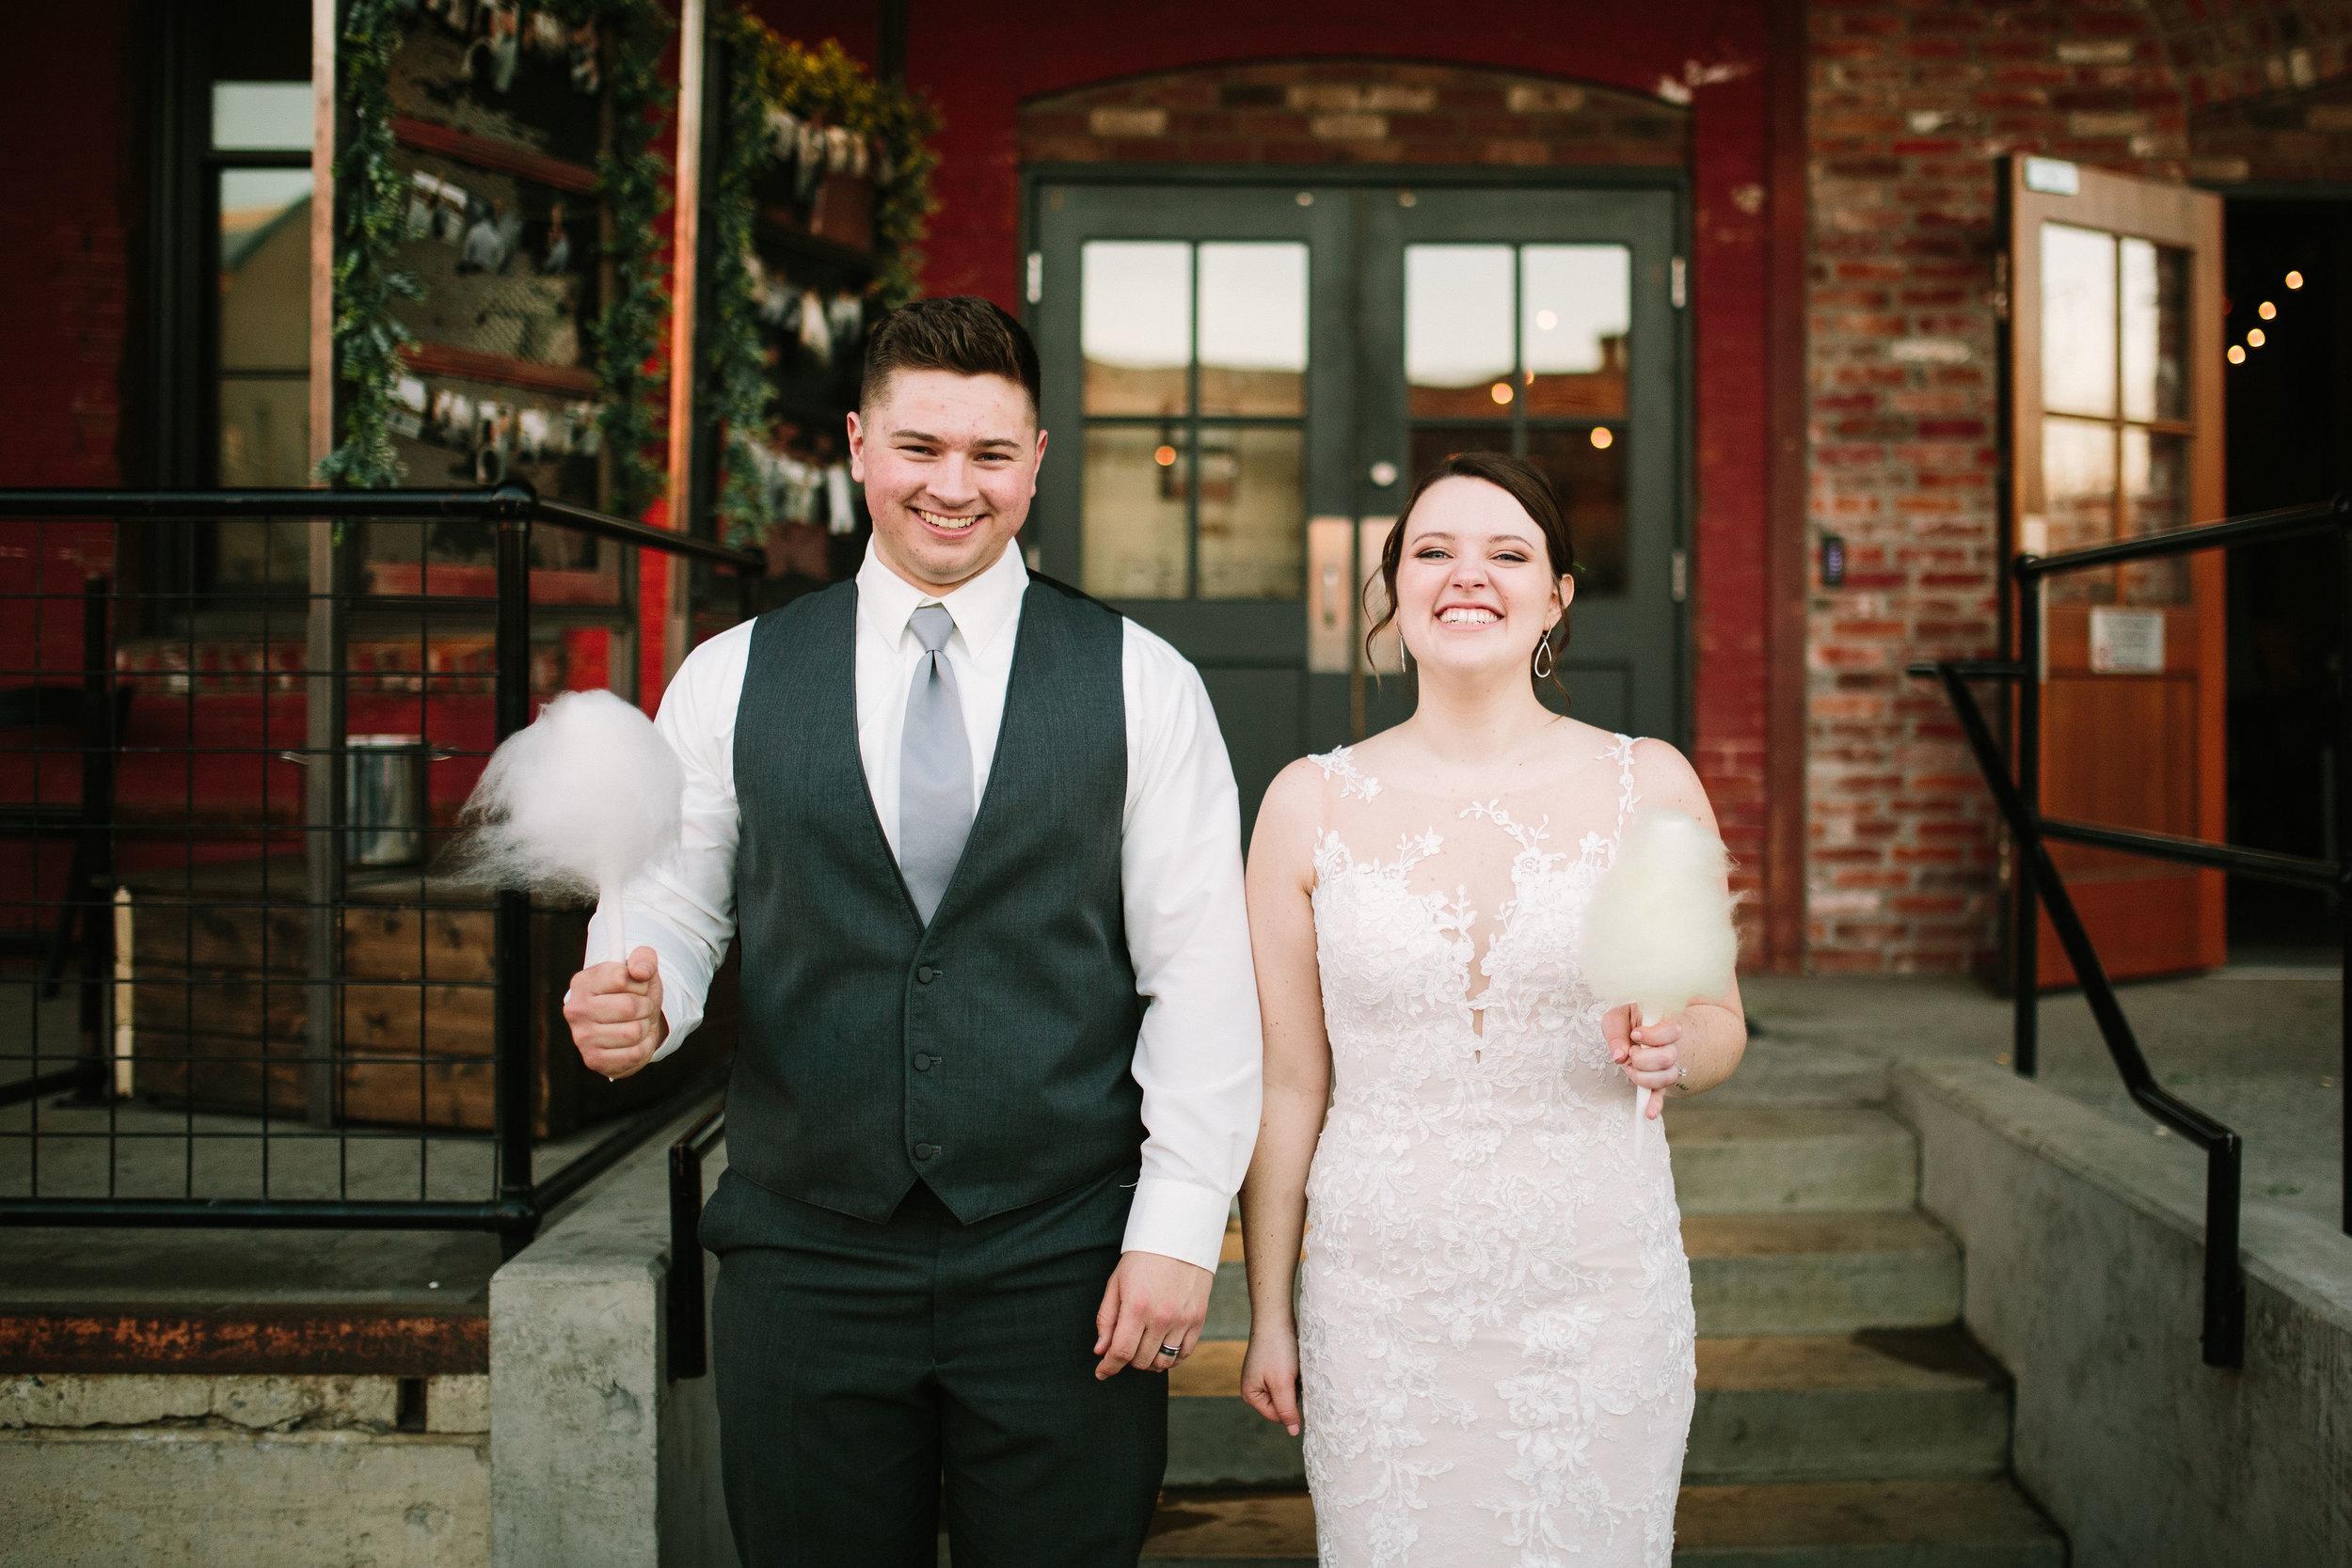 Fun Rustic spokane wedding smiling standing together wedding day cheesing